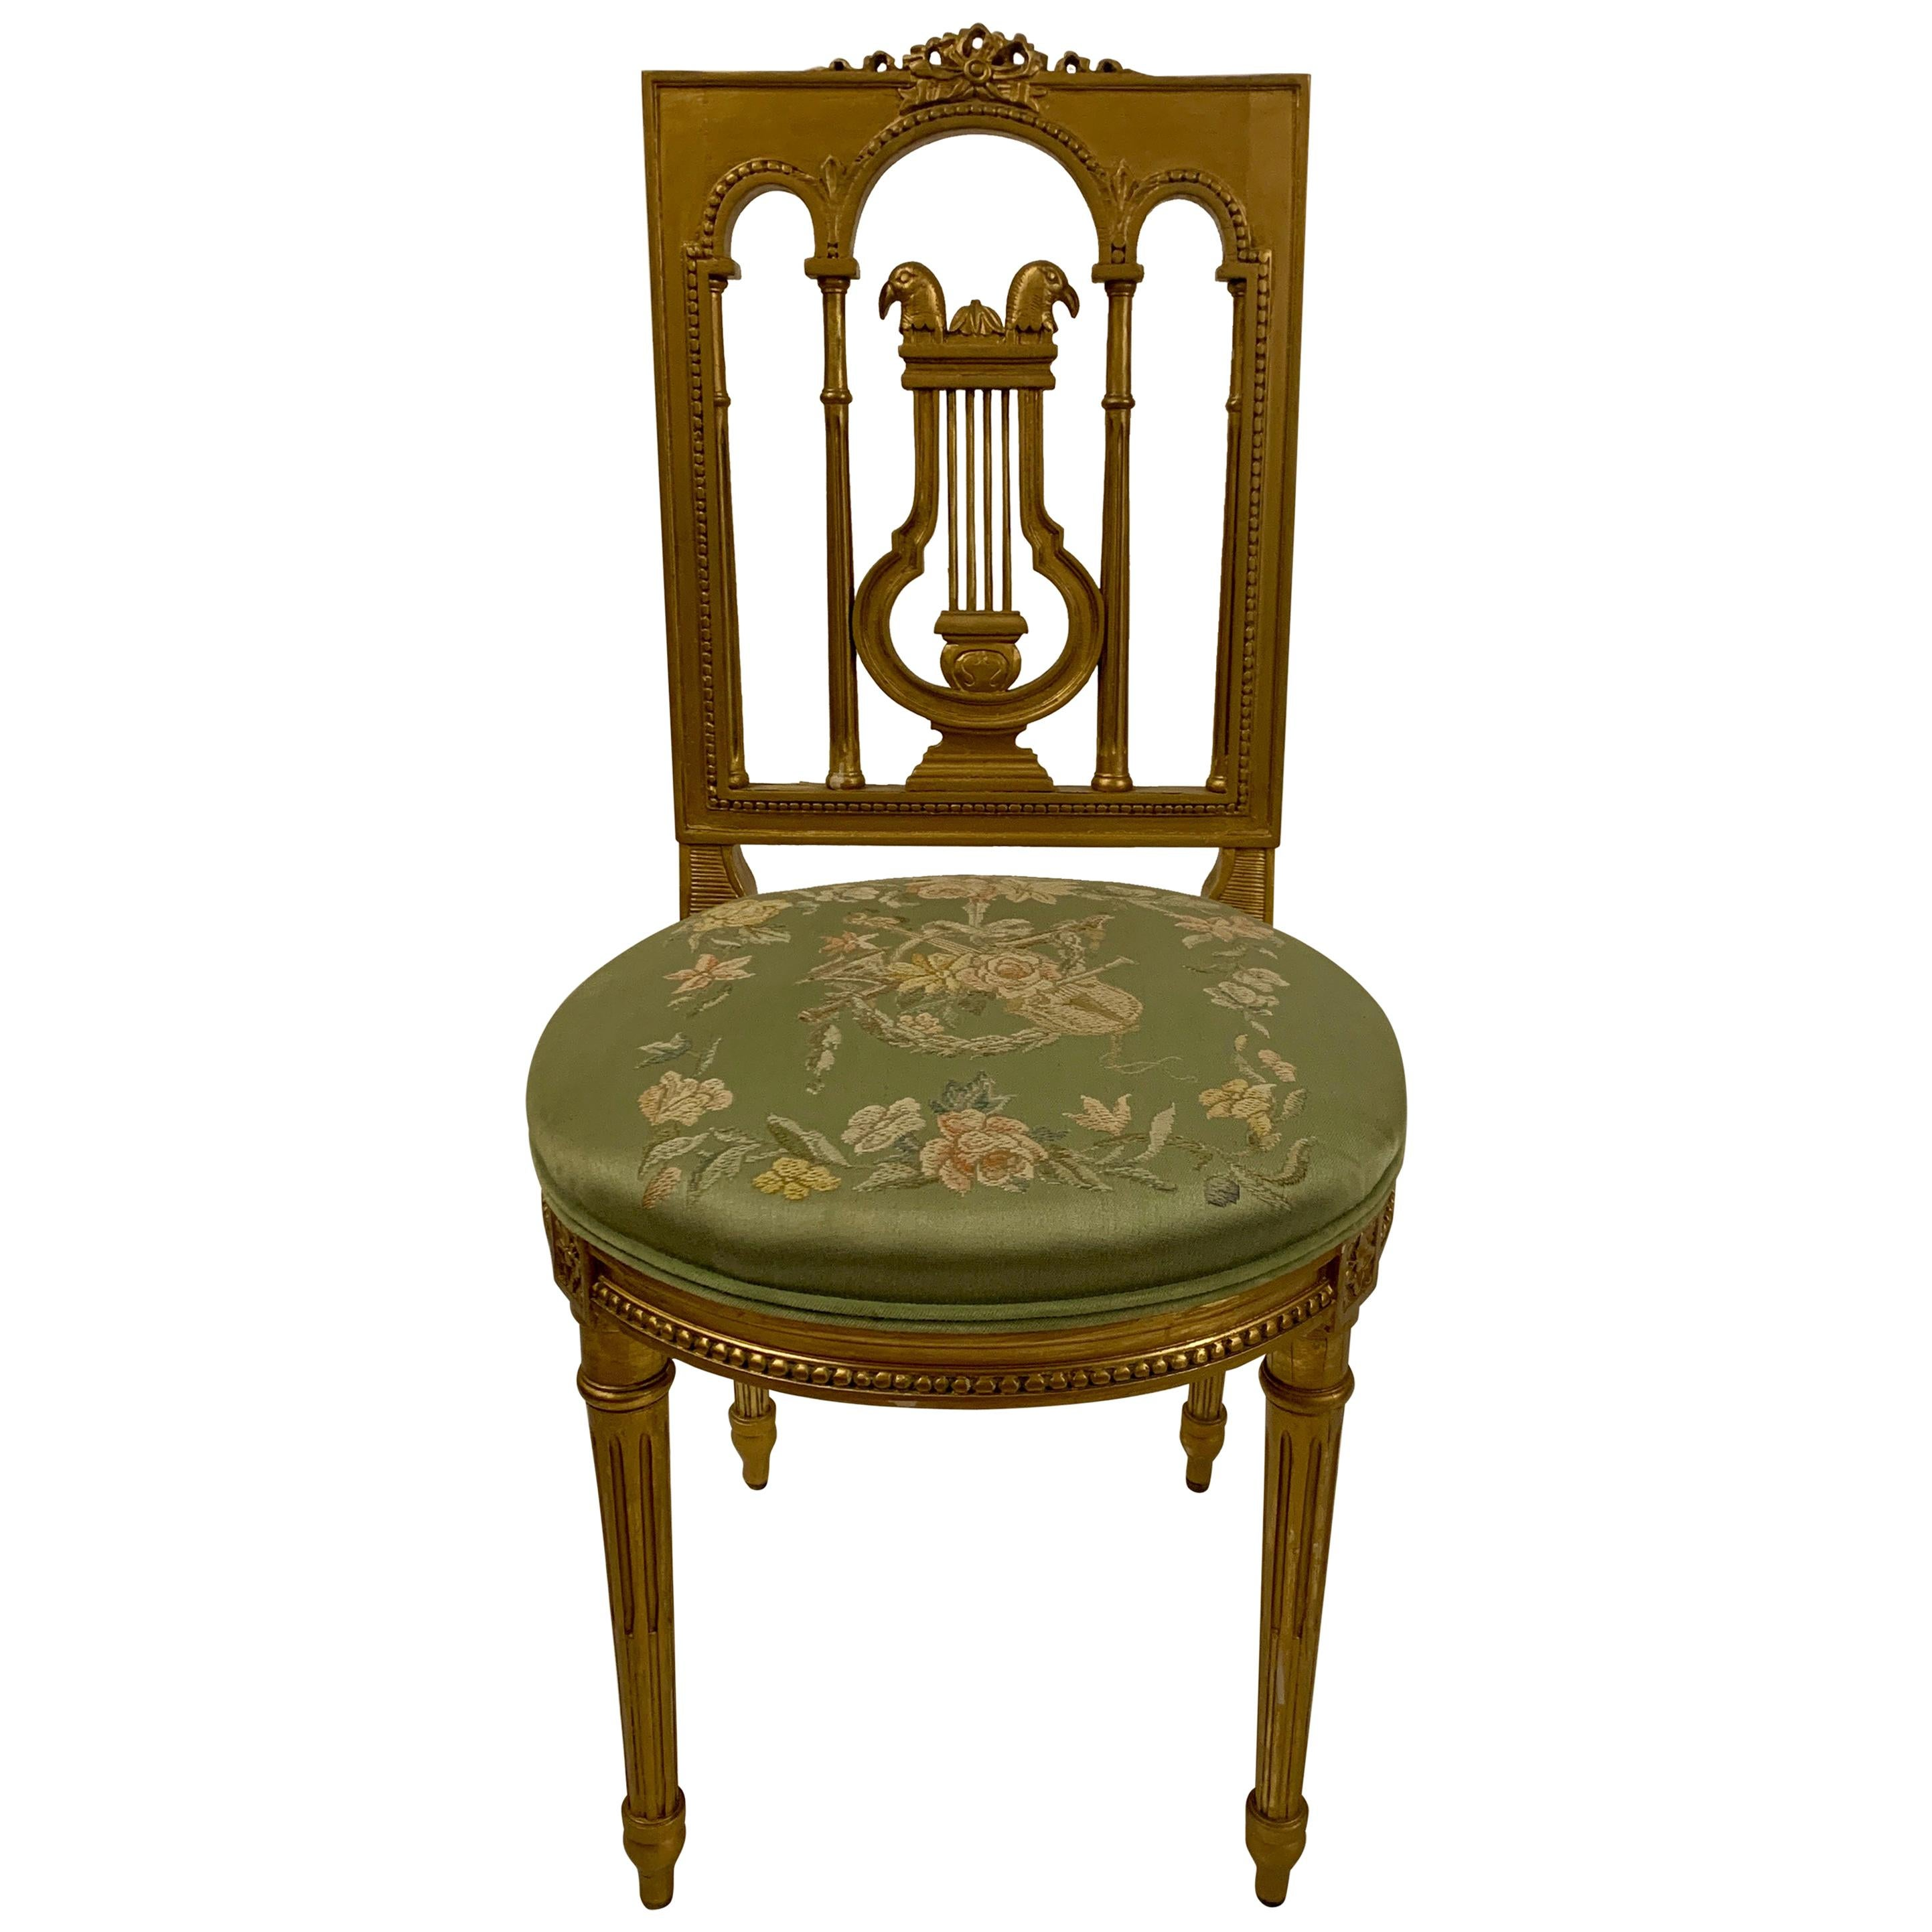 Antique French 19th Century Louis XVI Gilt Side Chair, circa 1880